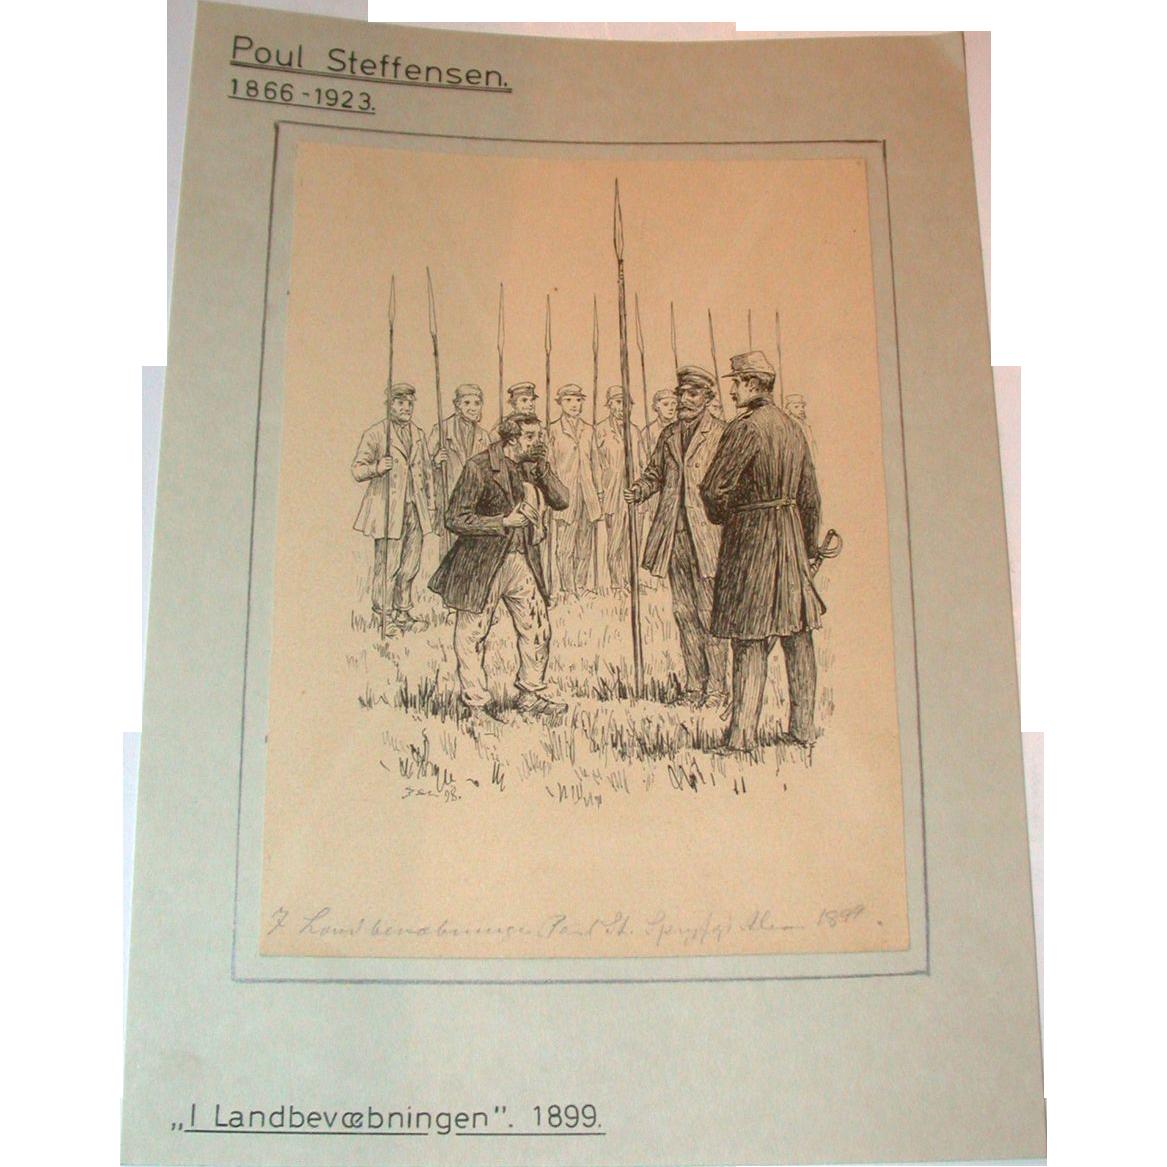 Poul Steffensen (1866-1923) - Original Antique Pencil, Pen and Watercolor Drawing on Paper, Circa 1899